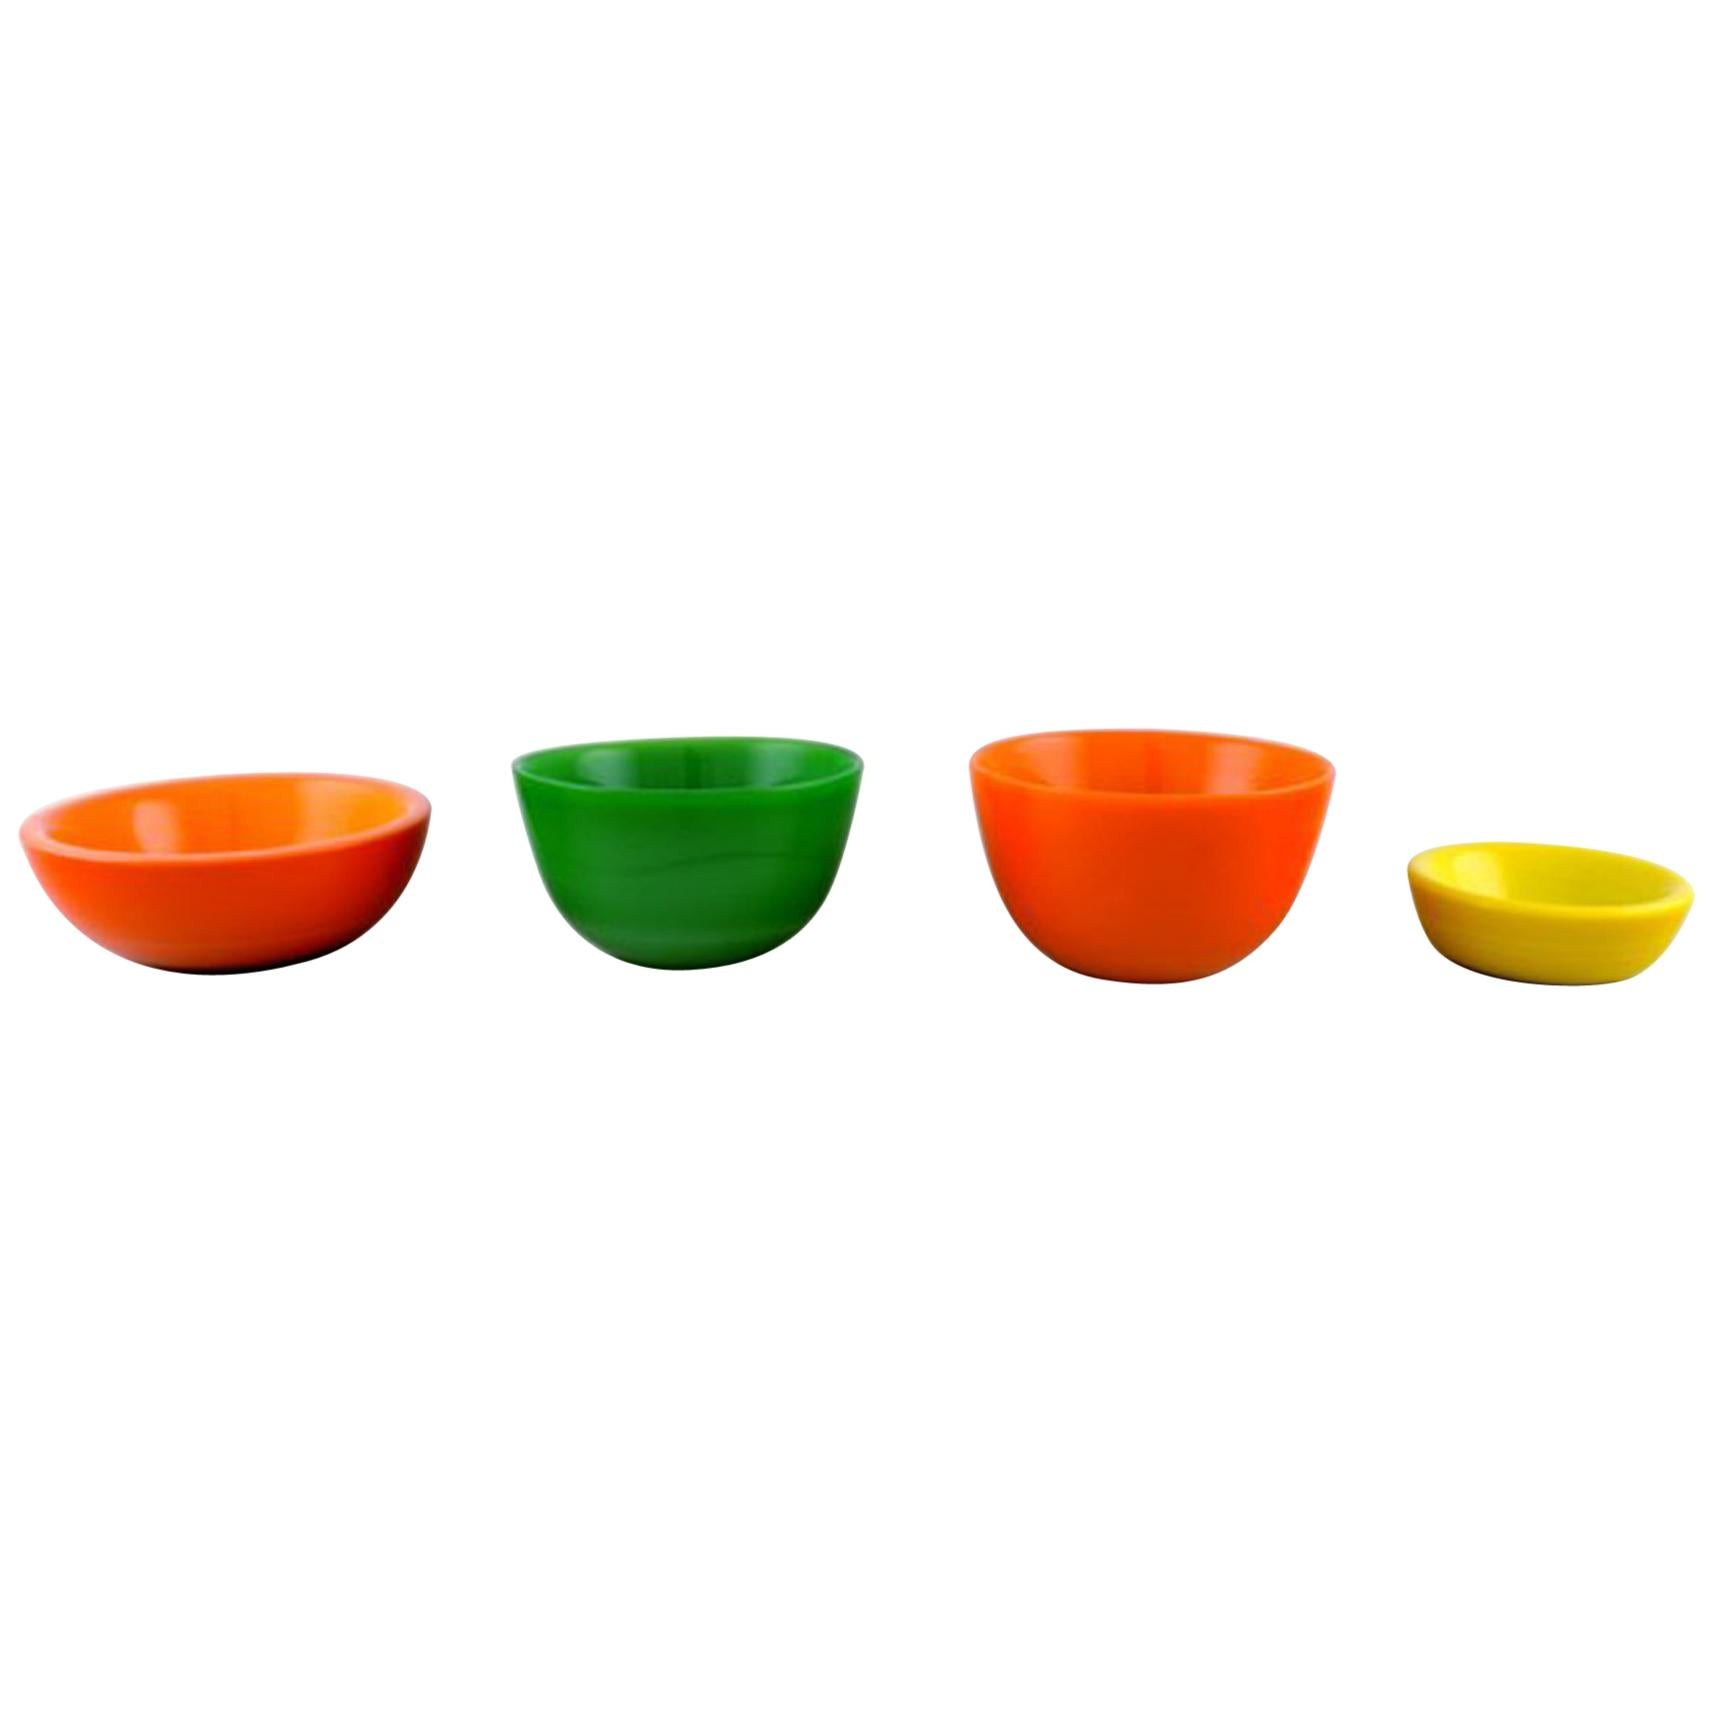 "Sven Palmqvist for Orrefors, Set of 4 ""Colora"" Bowls in Art Glass"